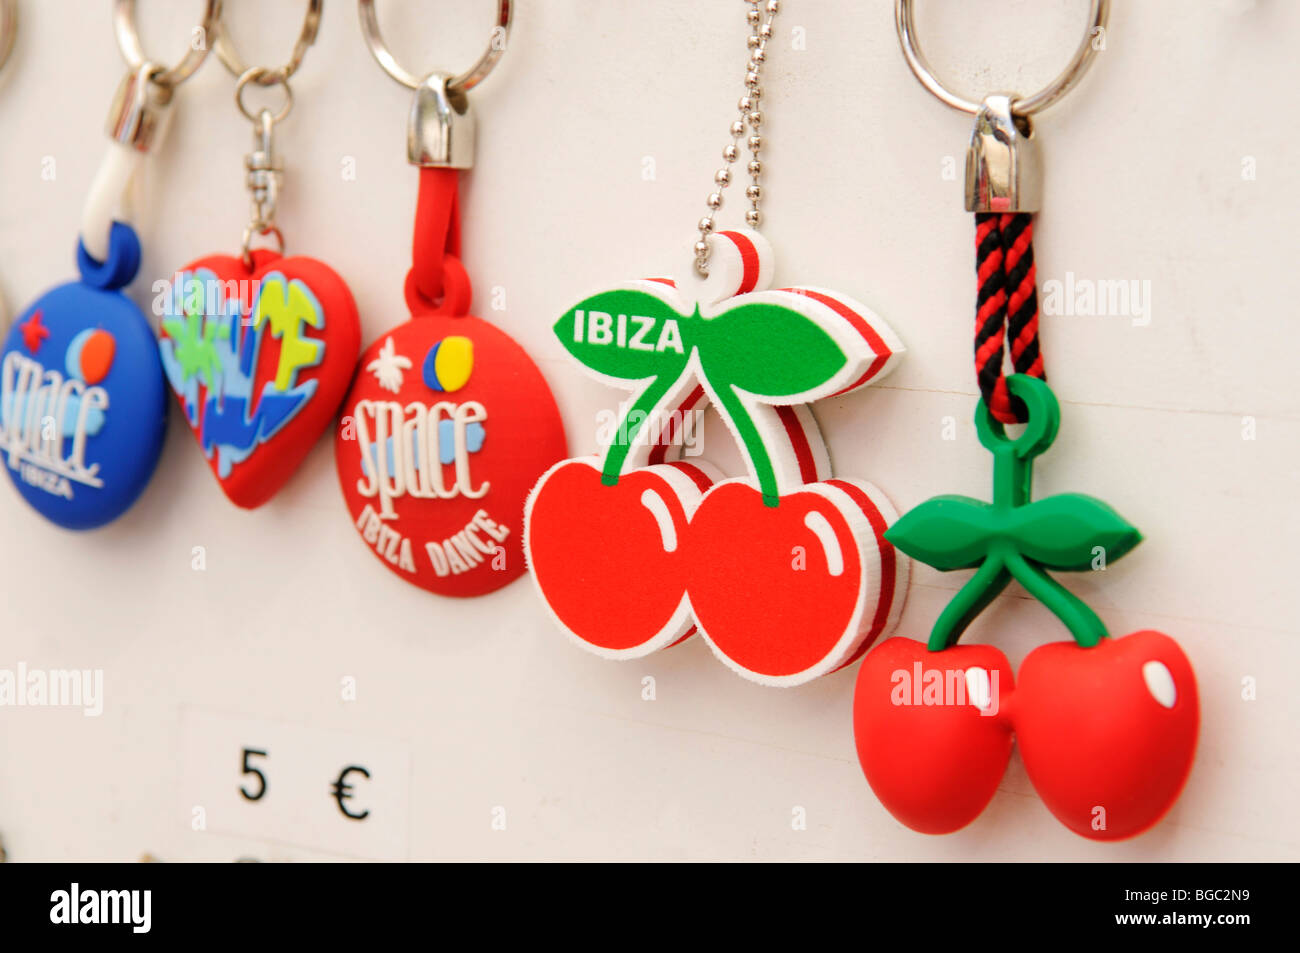 Key Ring dal Pacha, mercatino hippy, Es Cana o Es Canar, Punta Arabi, Ibiza, Isole di pino, isole Baleari, Spagna, Immagini Stock